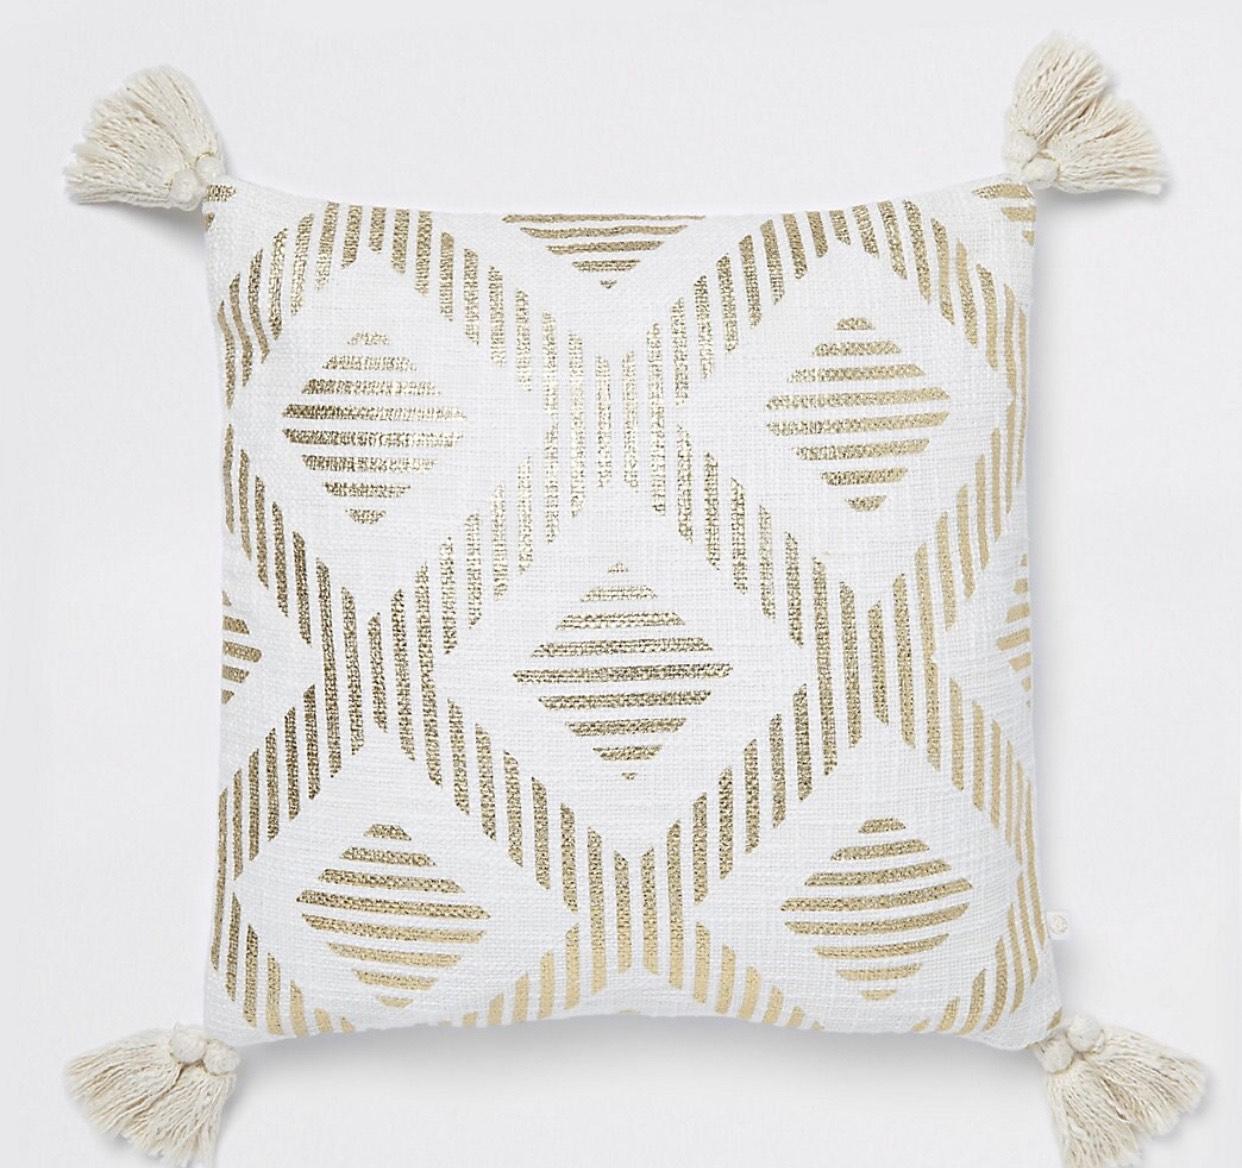 Gold print tassel cushion £3 @ river island £1 C&C